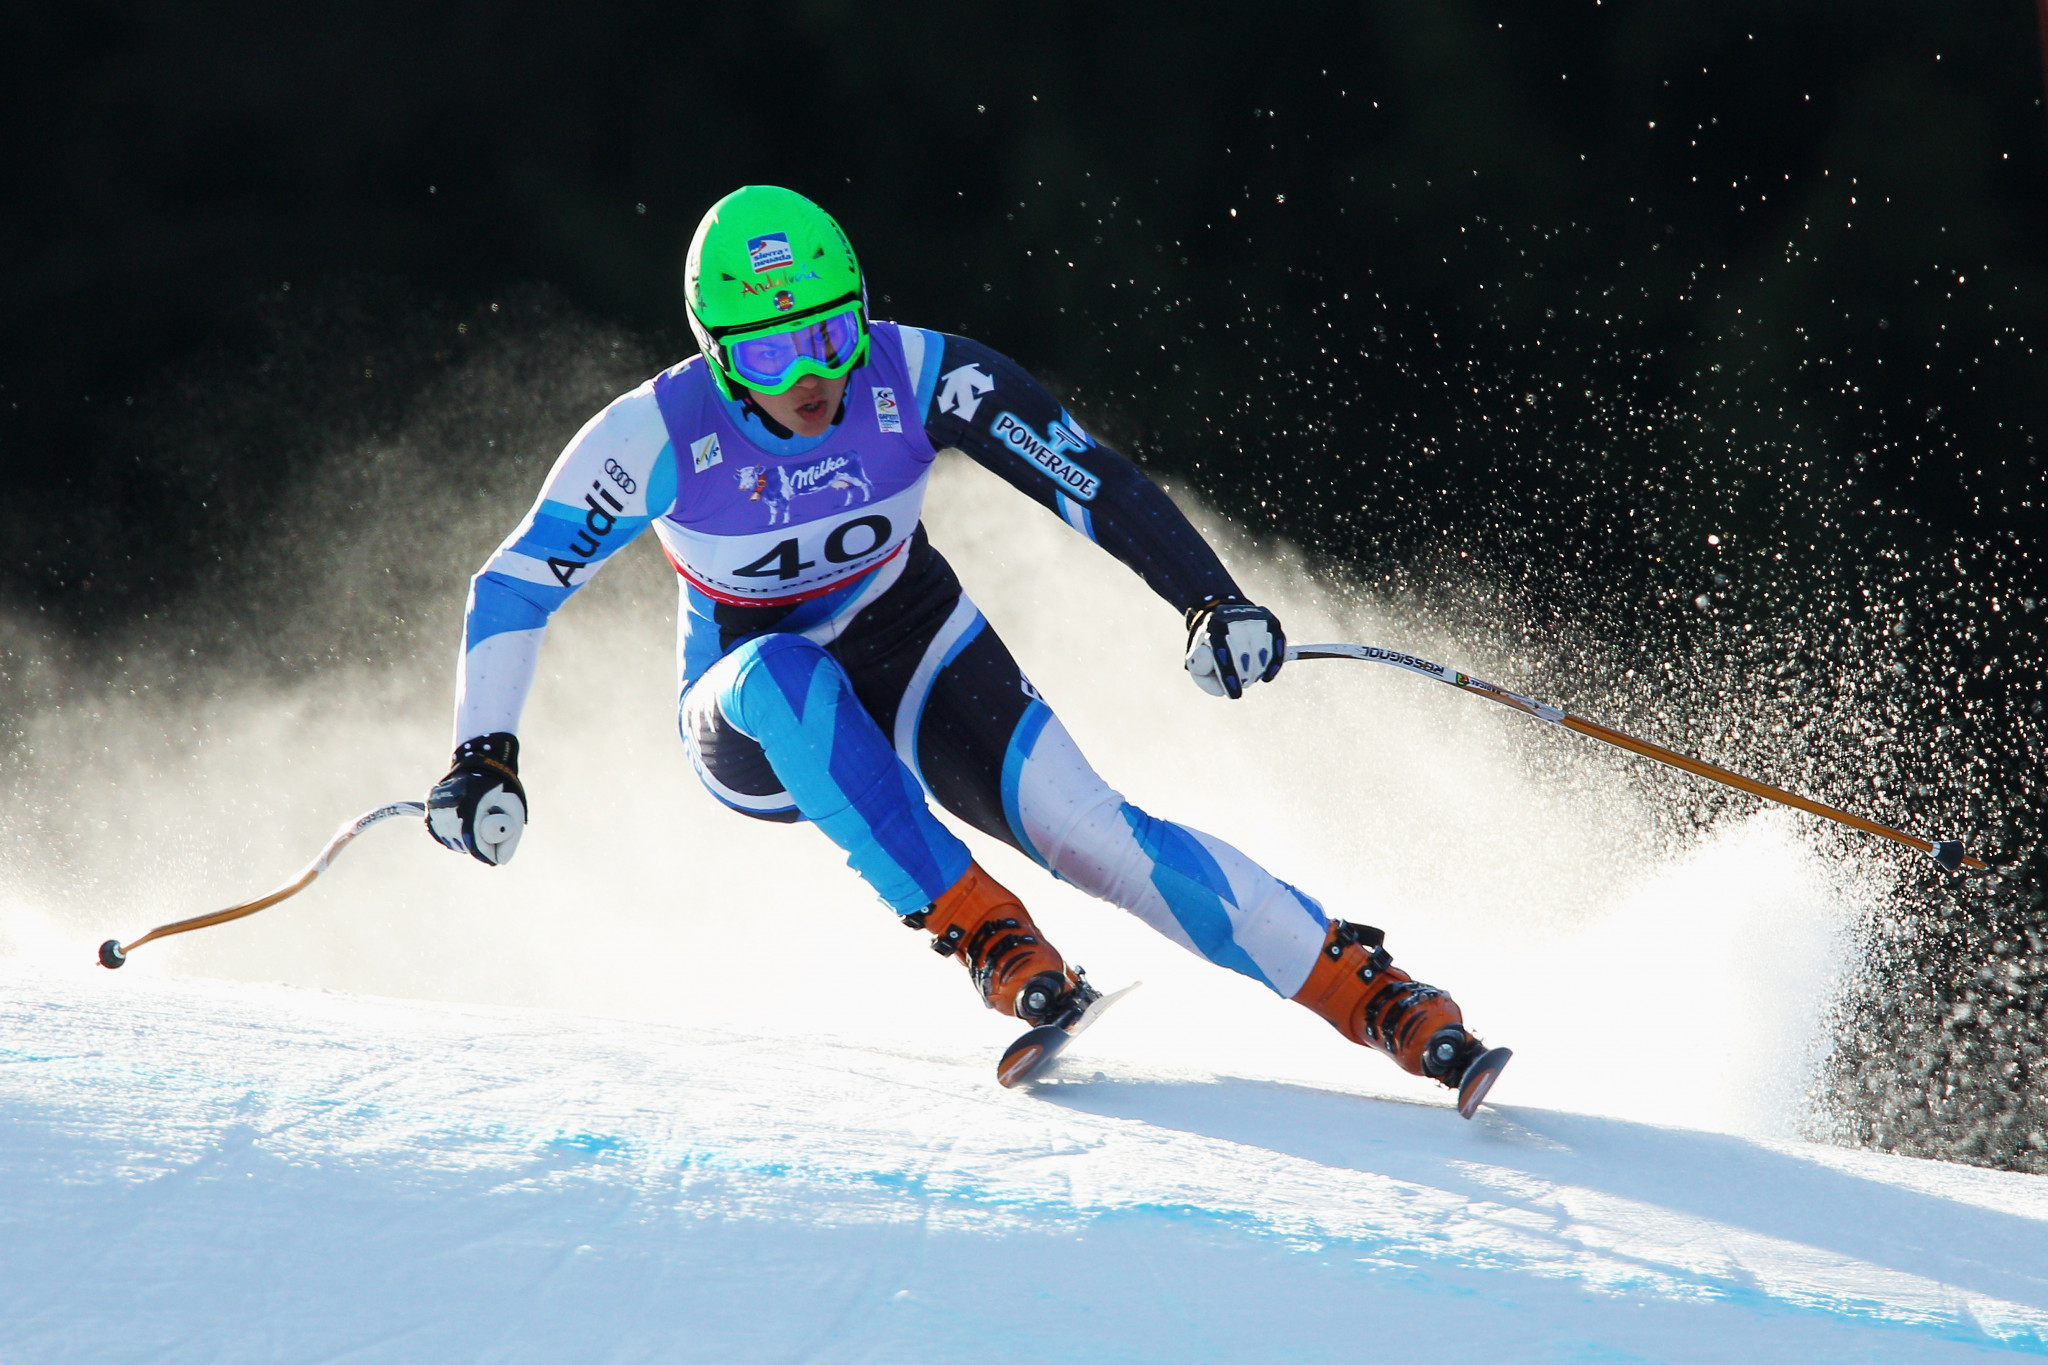 Five-time Olympian Rienda lands new role at Sierra Nevada ski resort